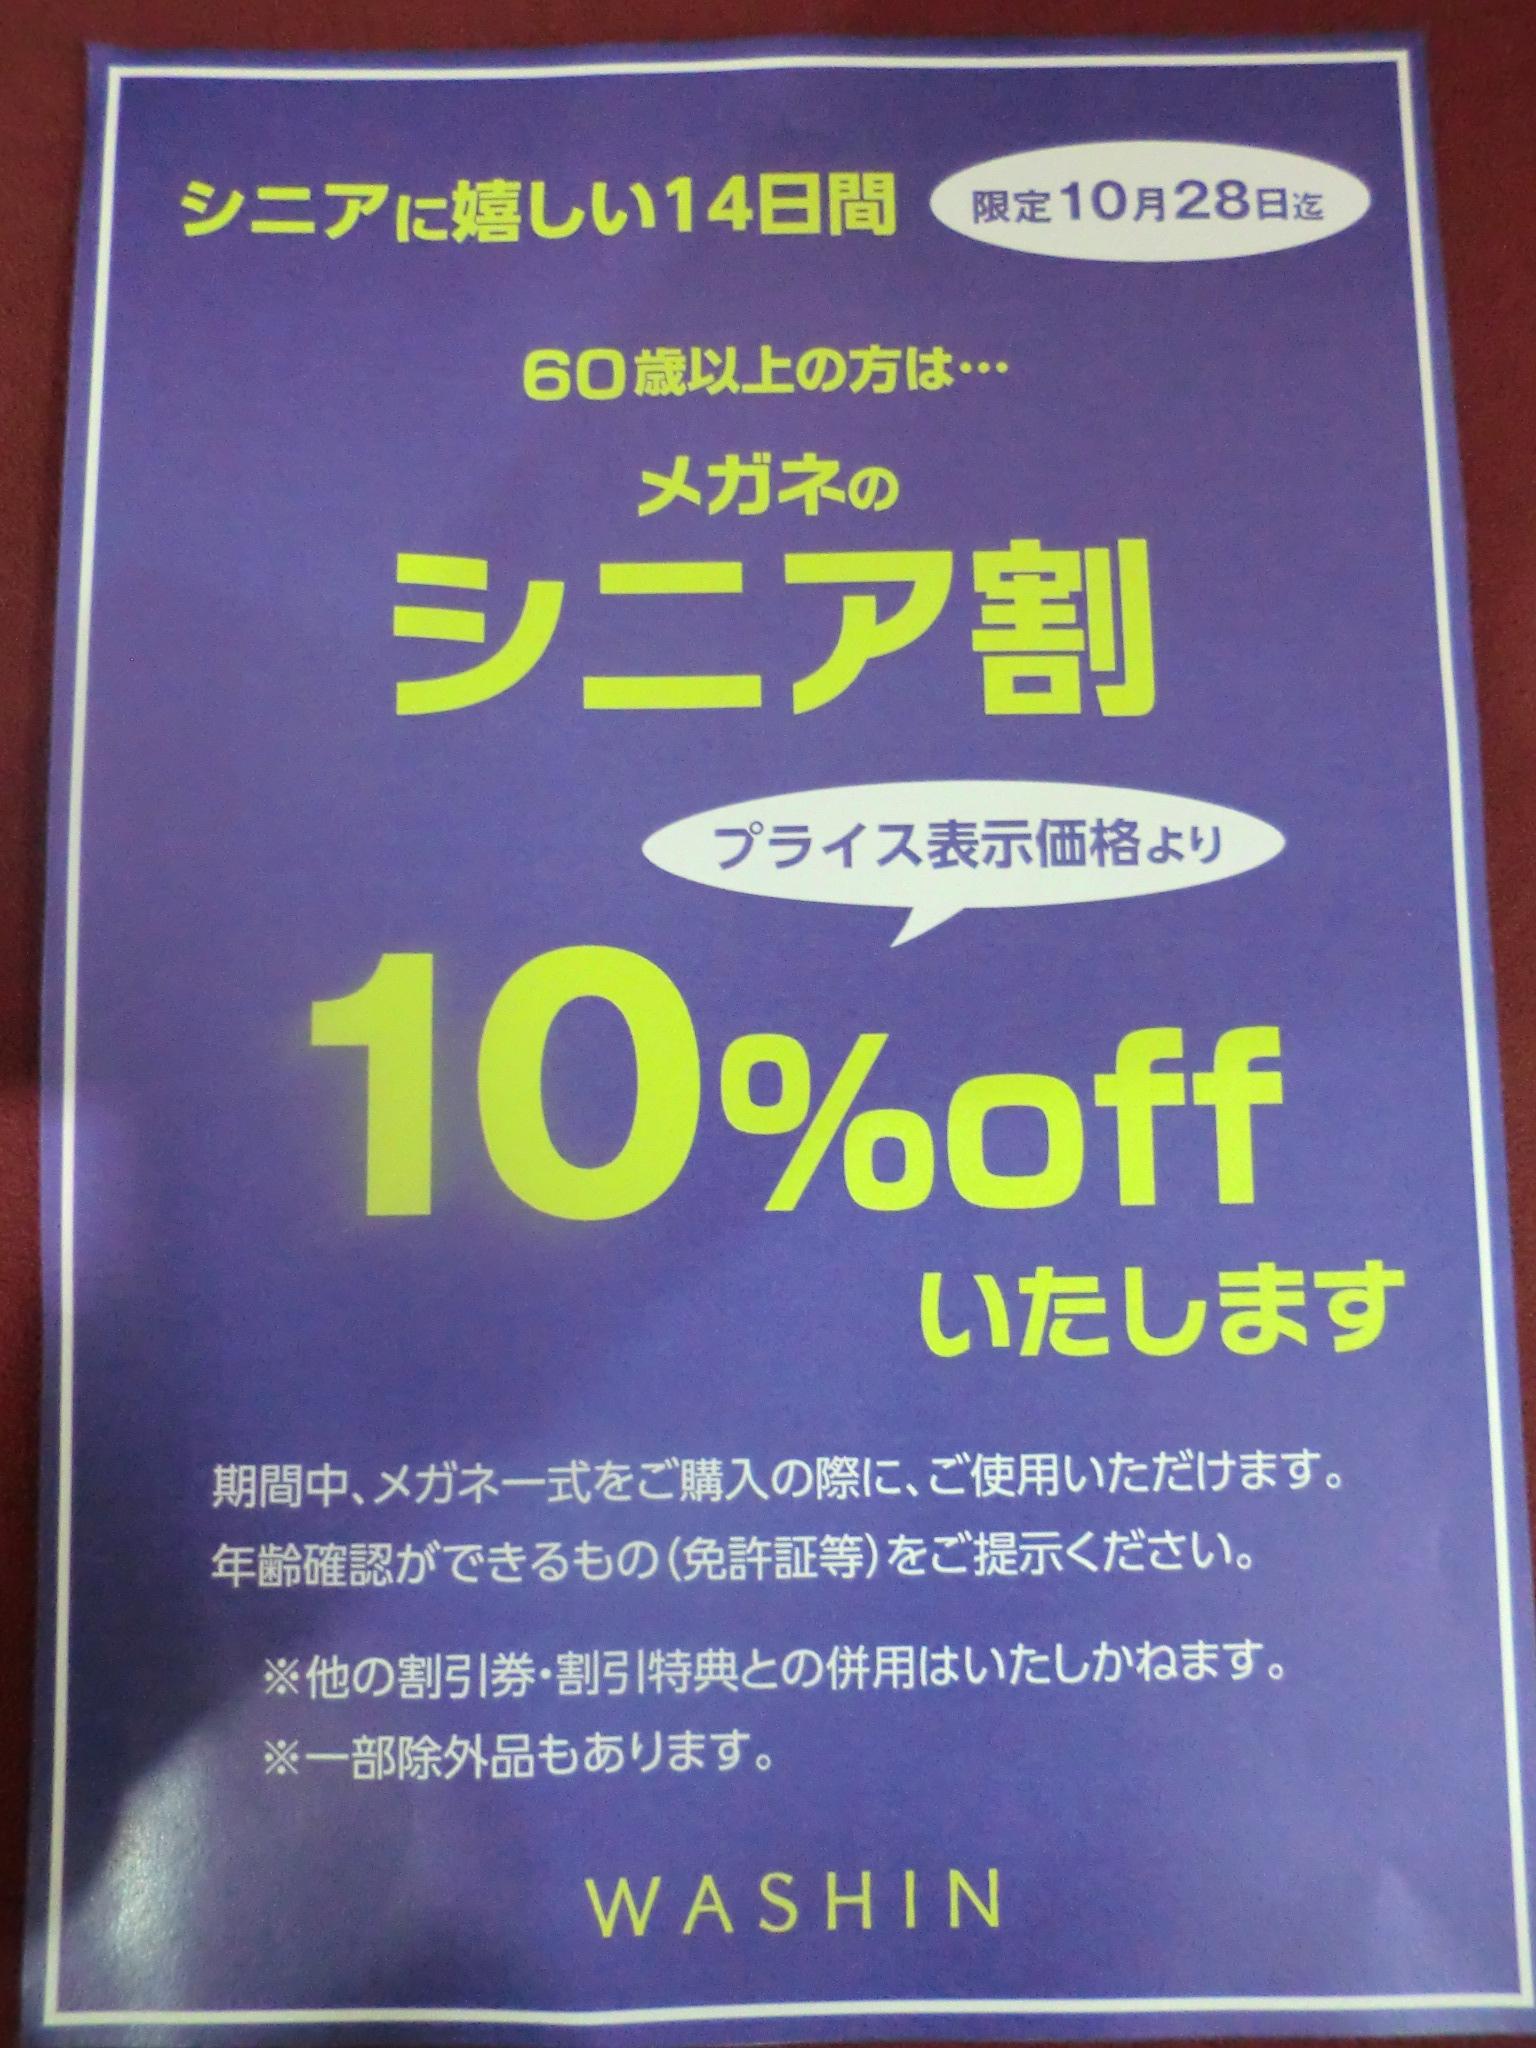 http://www.washin-optical.co.jp/blog/ladies/CIMG1230.JPG